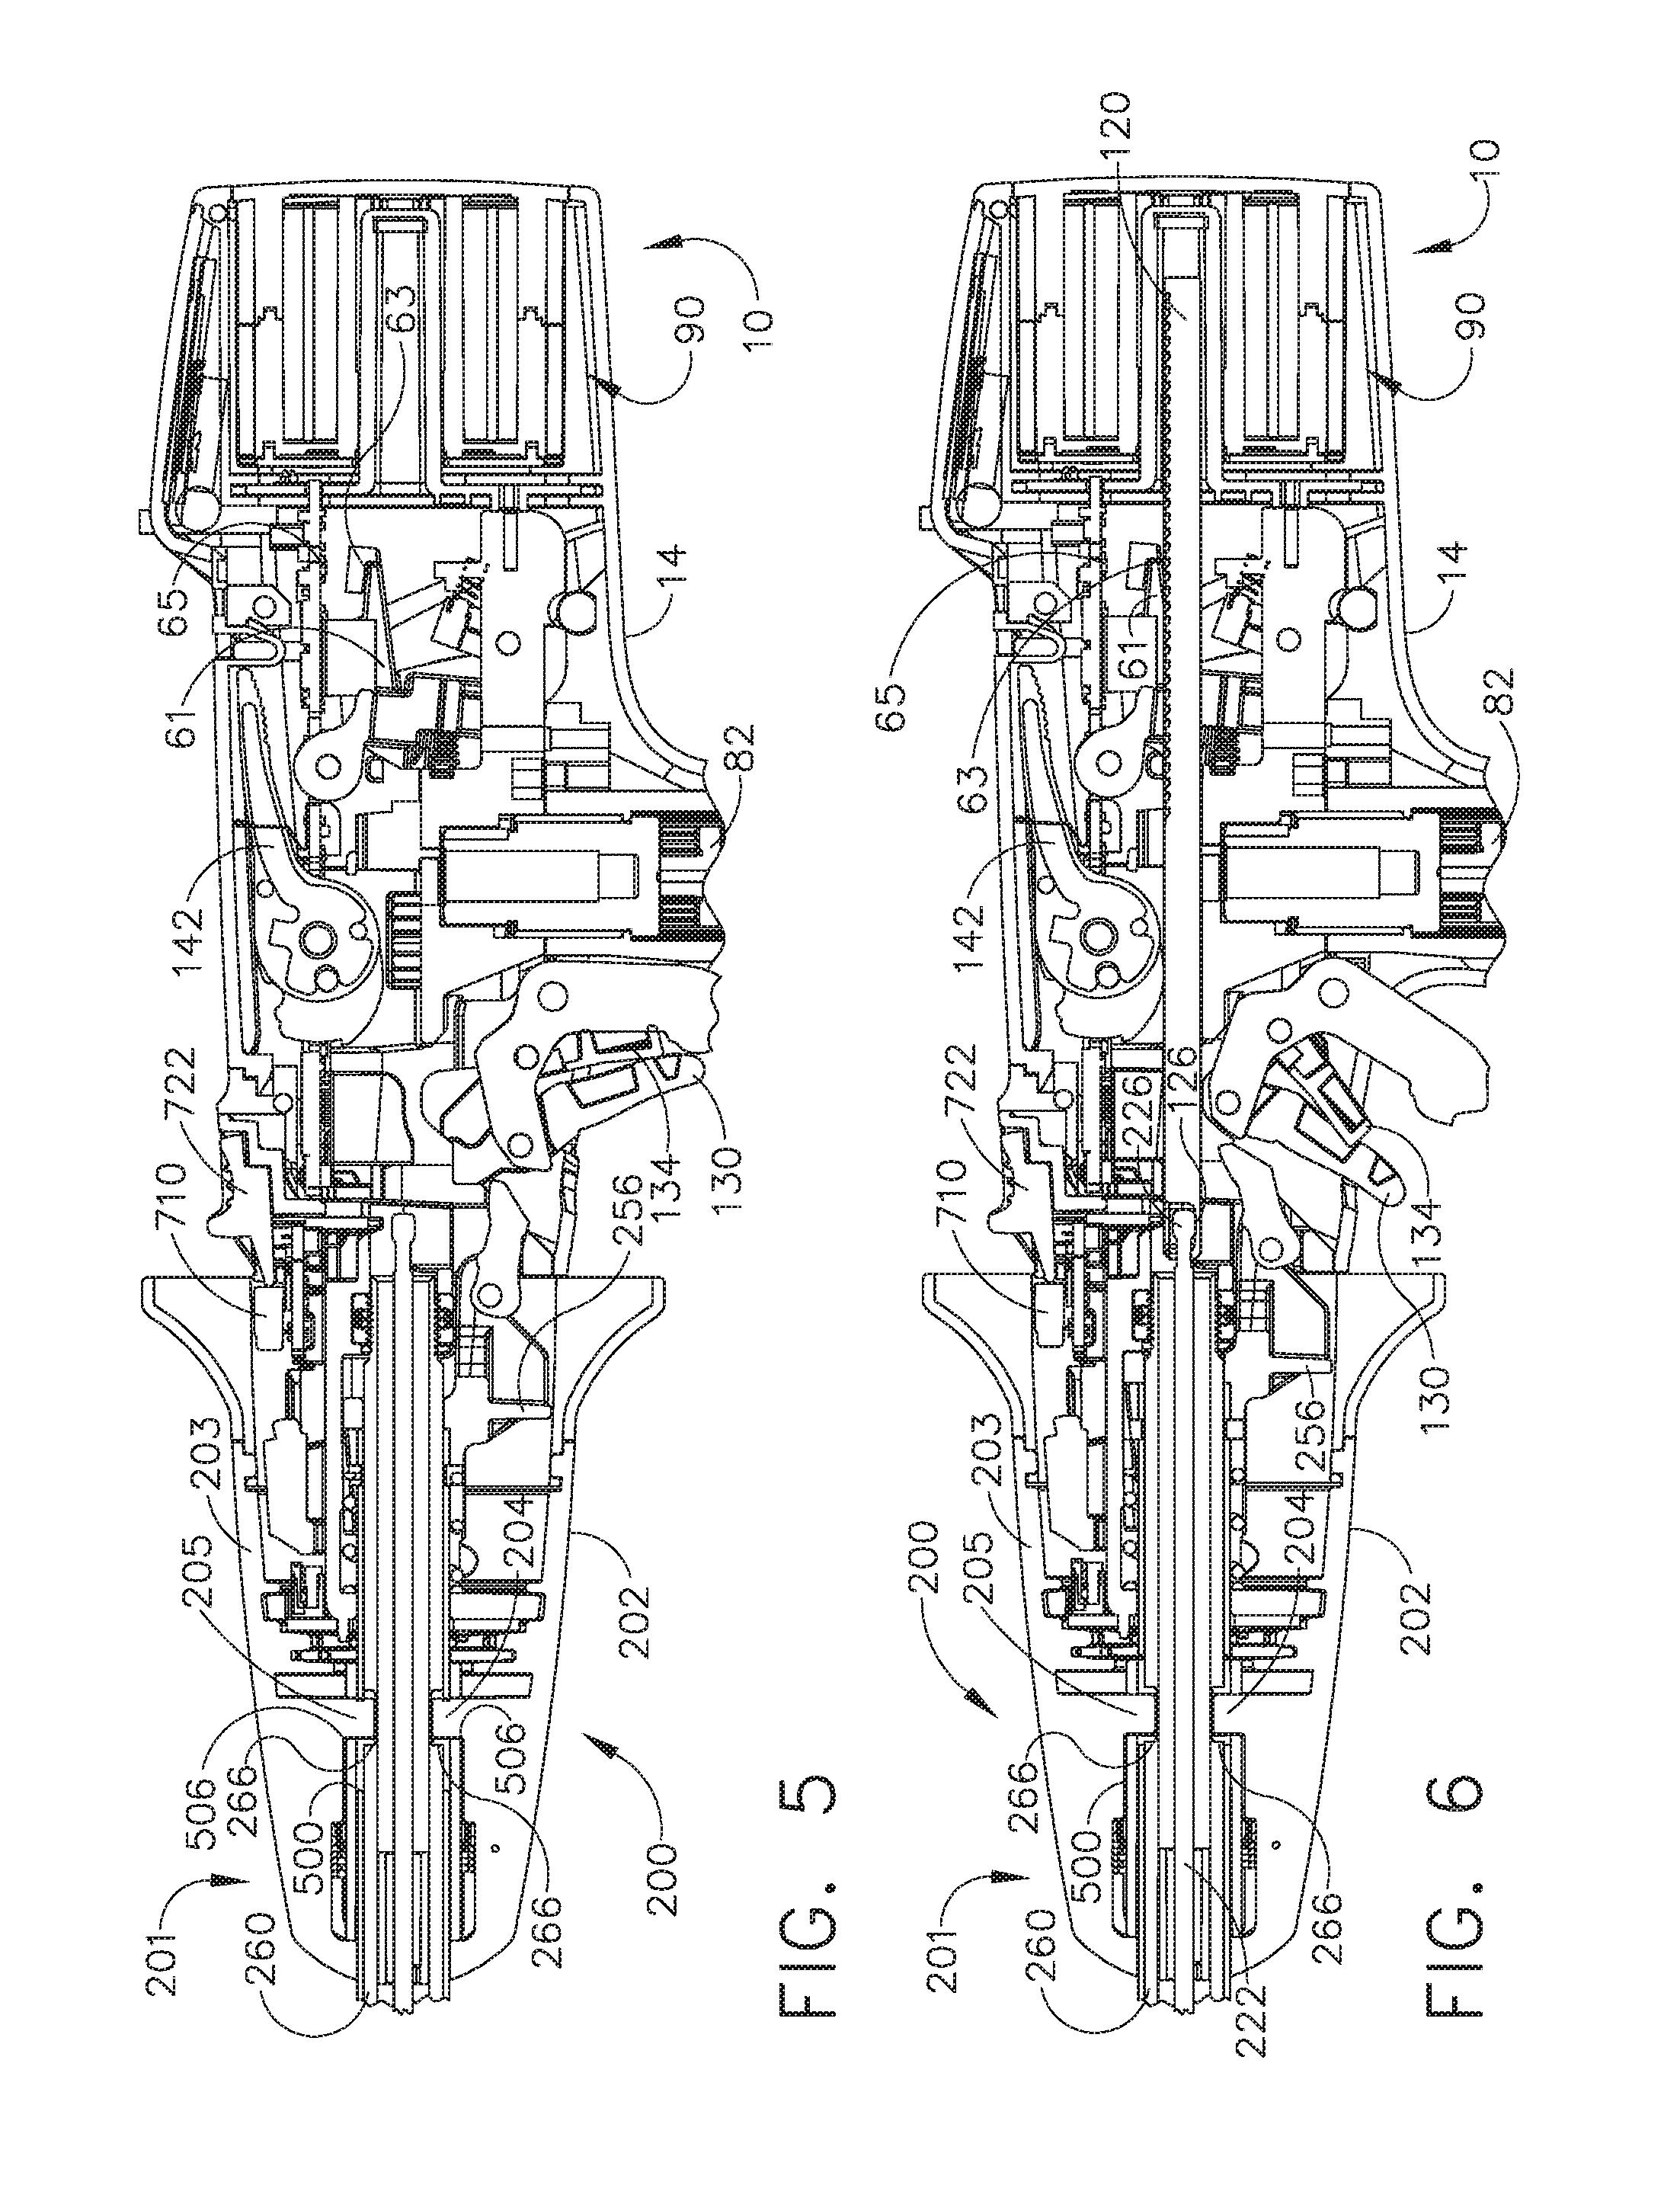 Us9743929b2 Modular Powered Surgical Instrument With Detachable 2005 John Deere 3120 Fuse Box Diagram Shaft Assemblies Google Patents